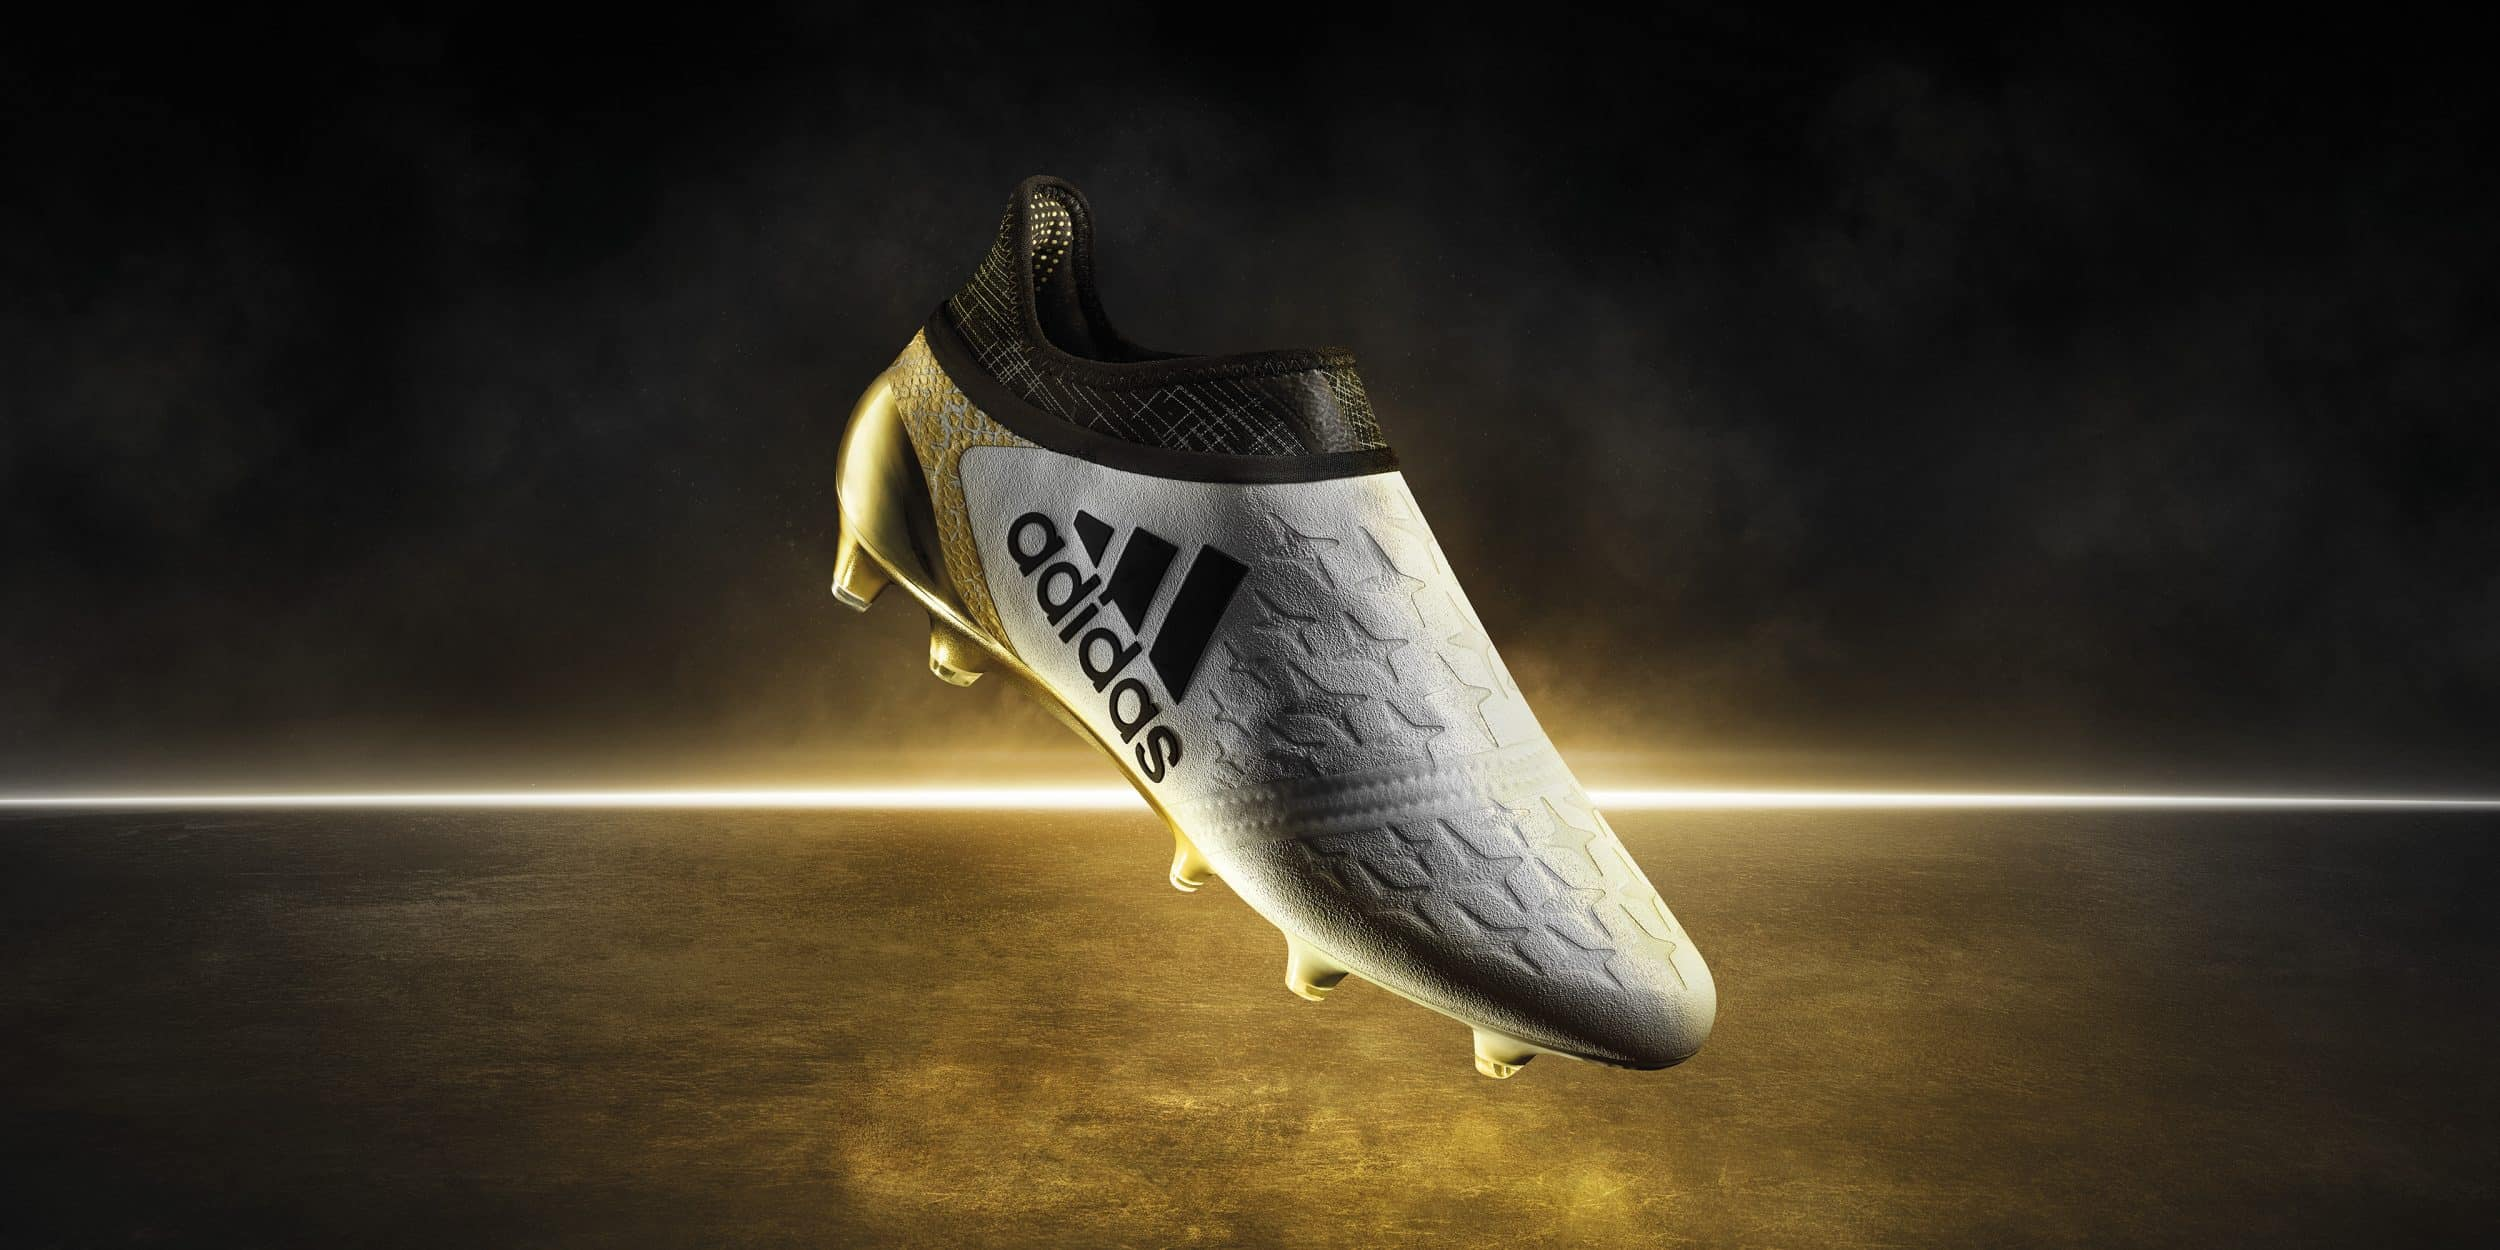 adidas-stellar-pack-x16-purechaos-2016-footpack